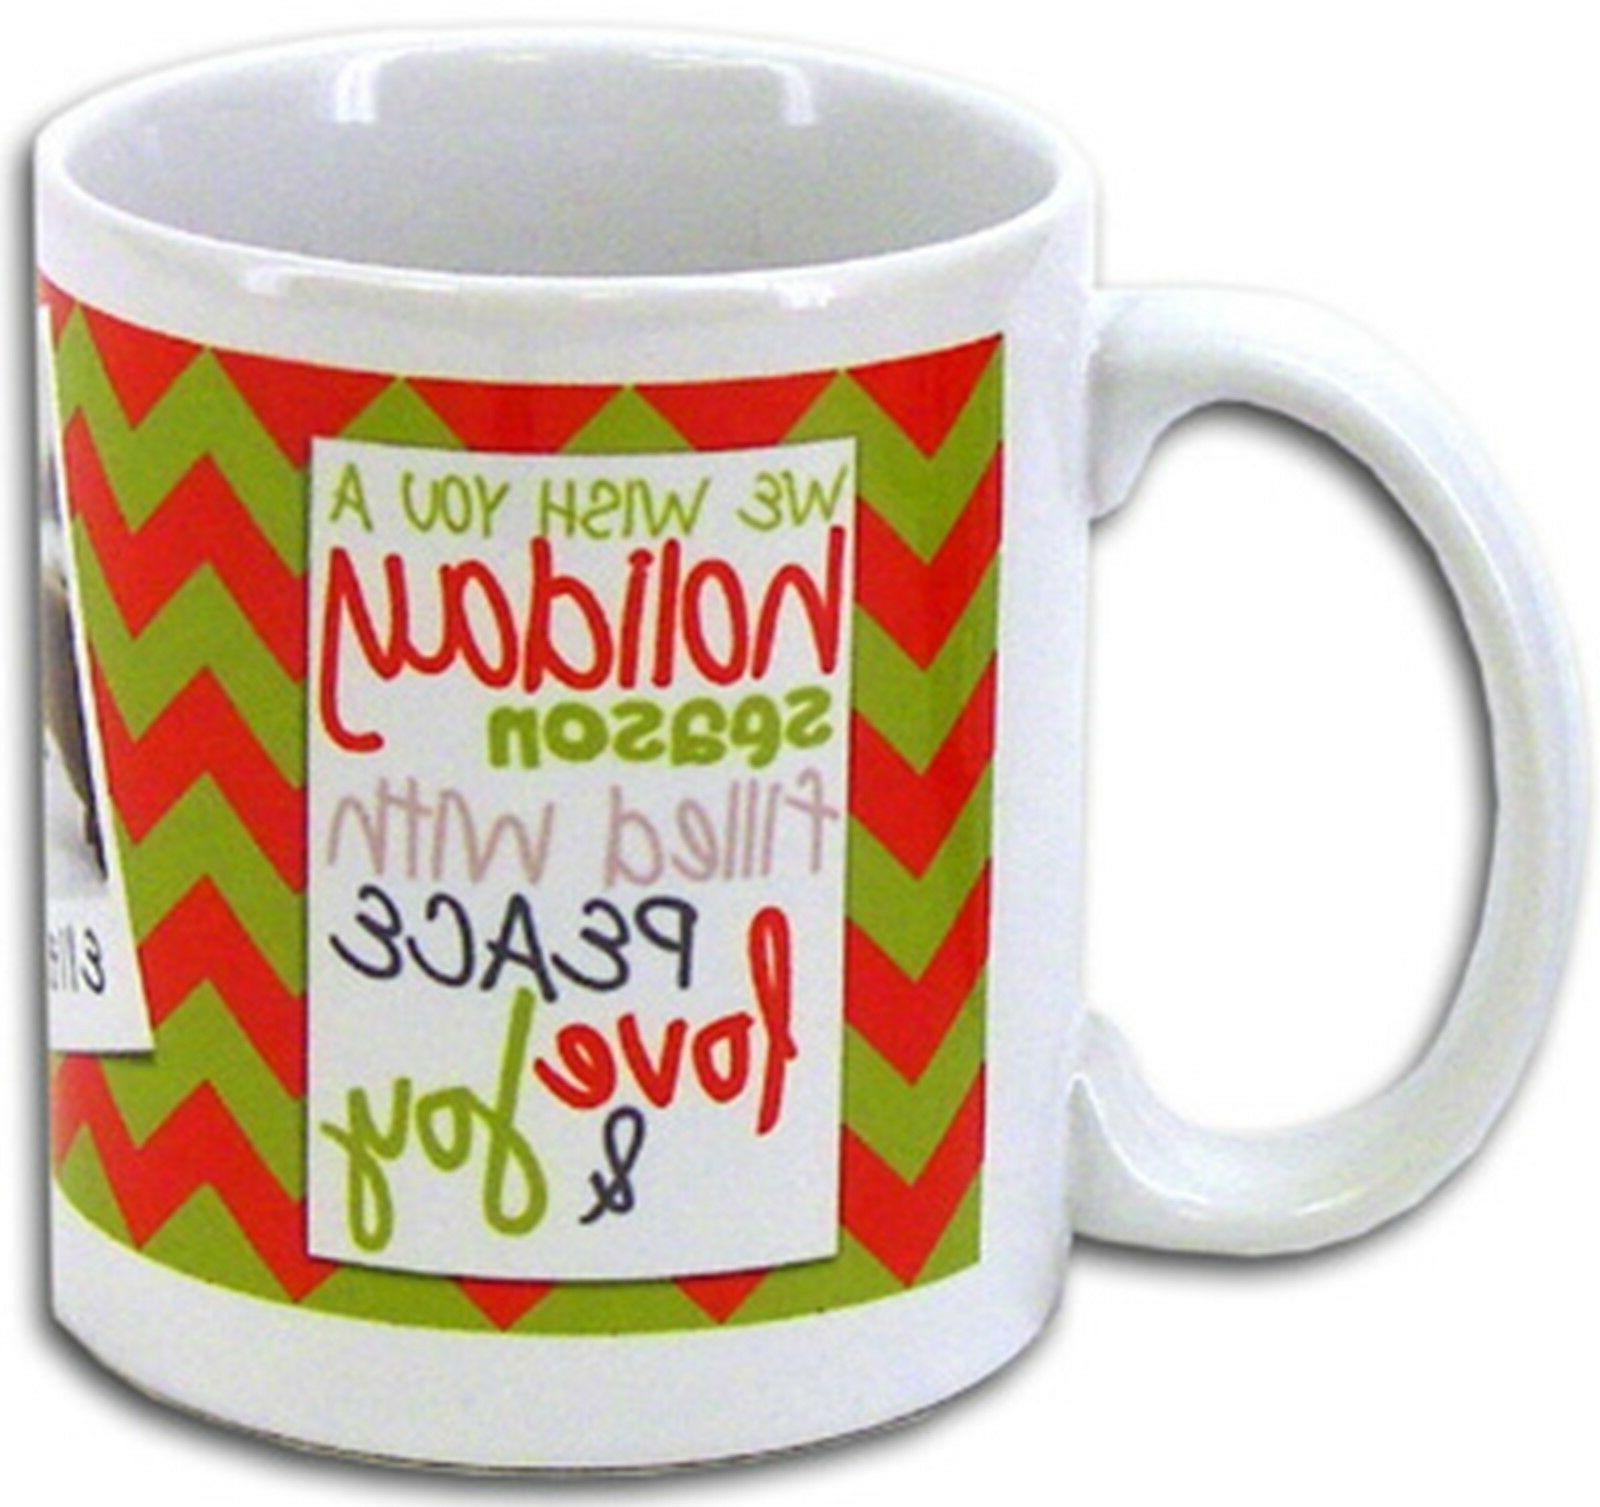 Coffee mug personalized Custom Photo Printed Gift Ceramic